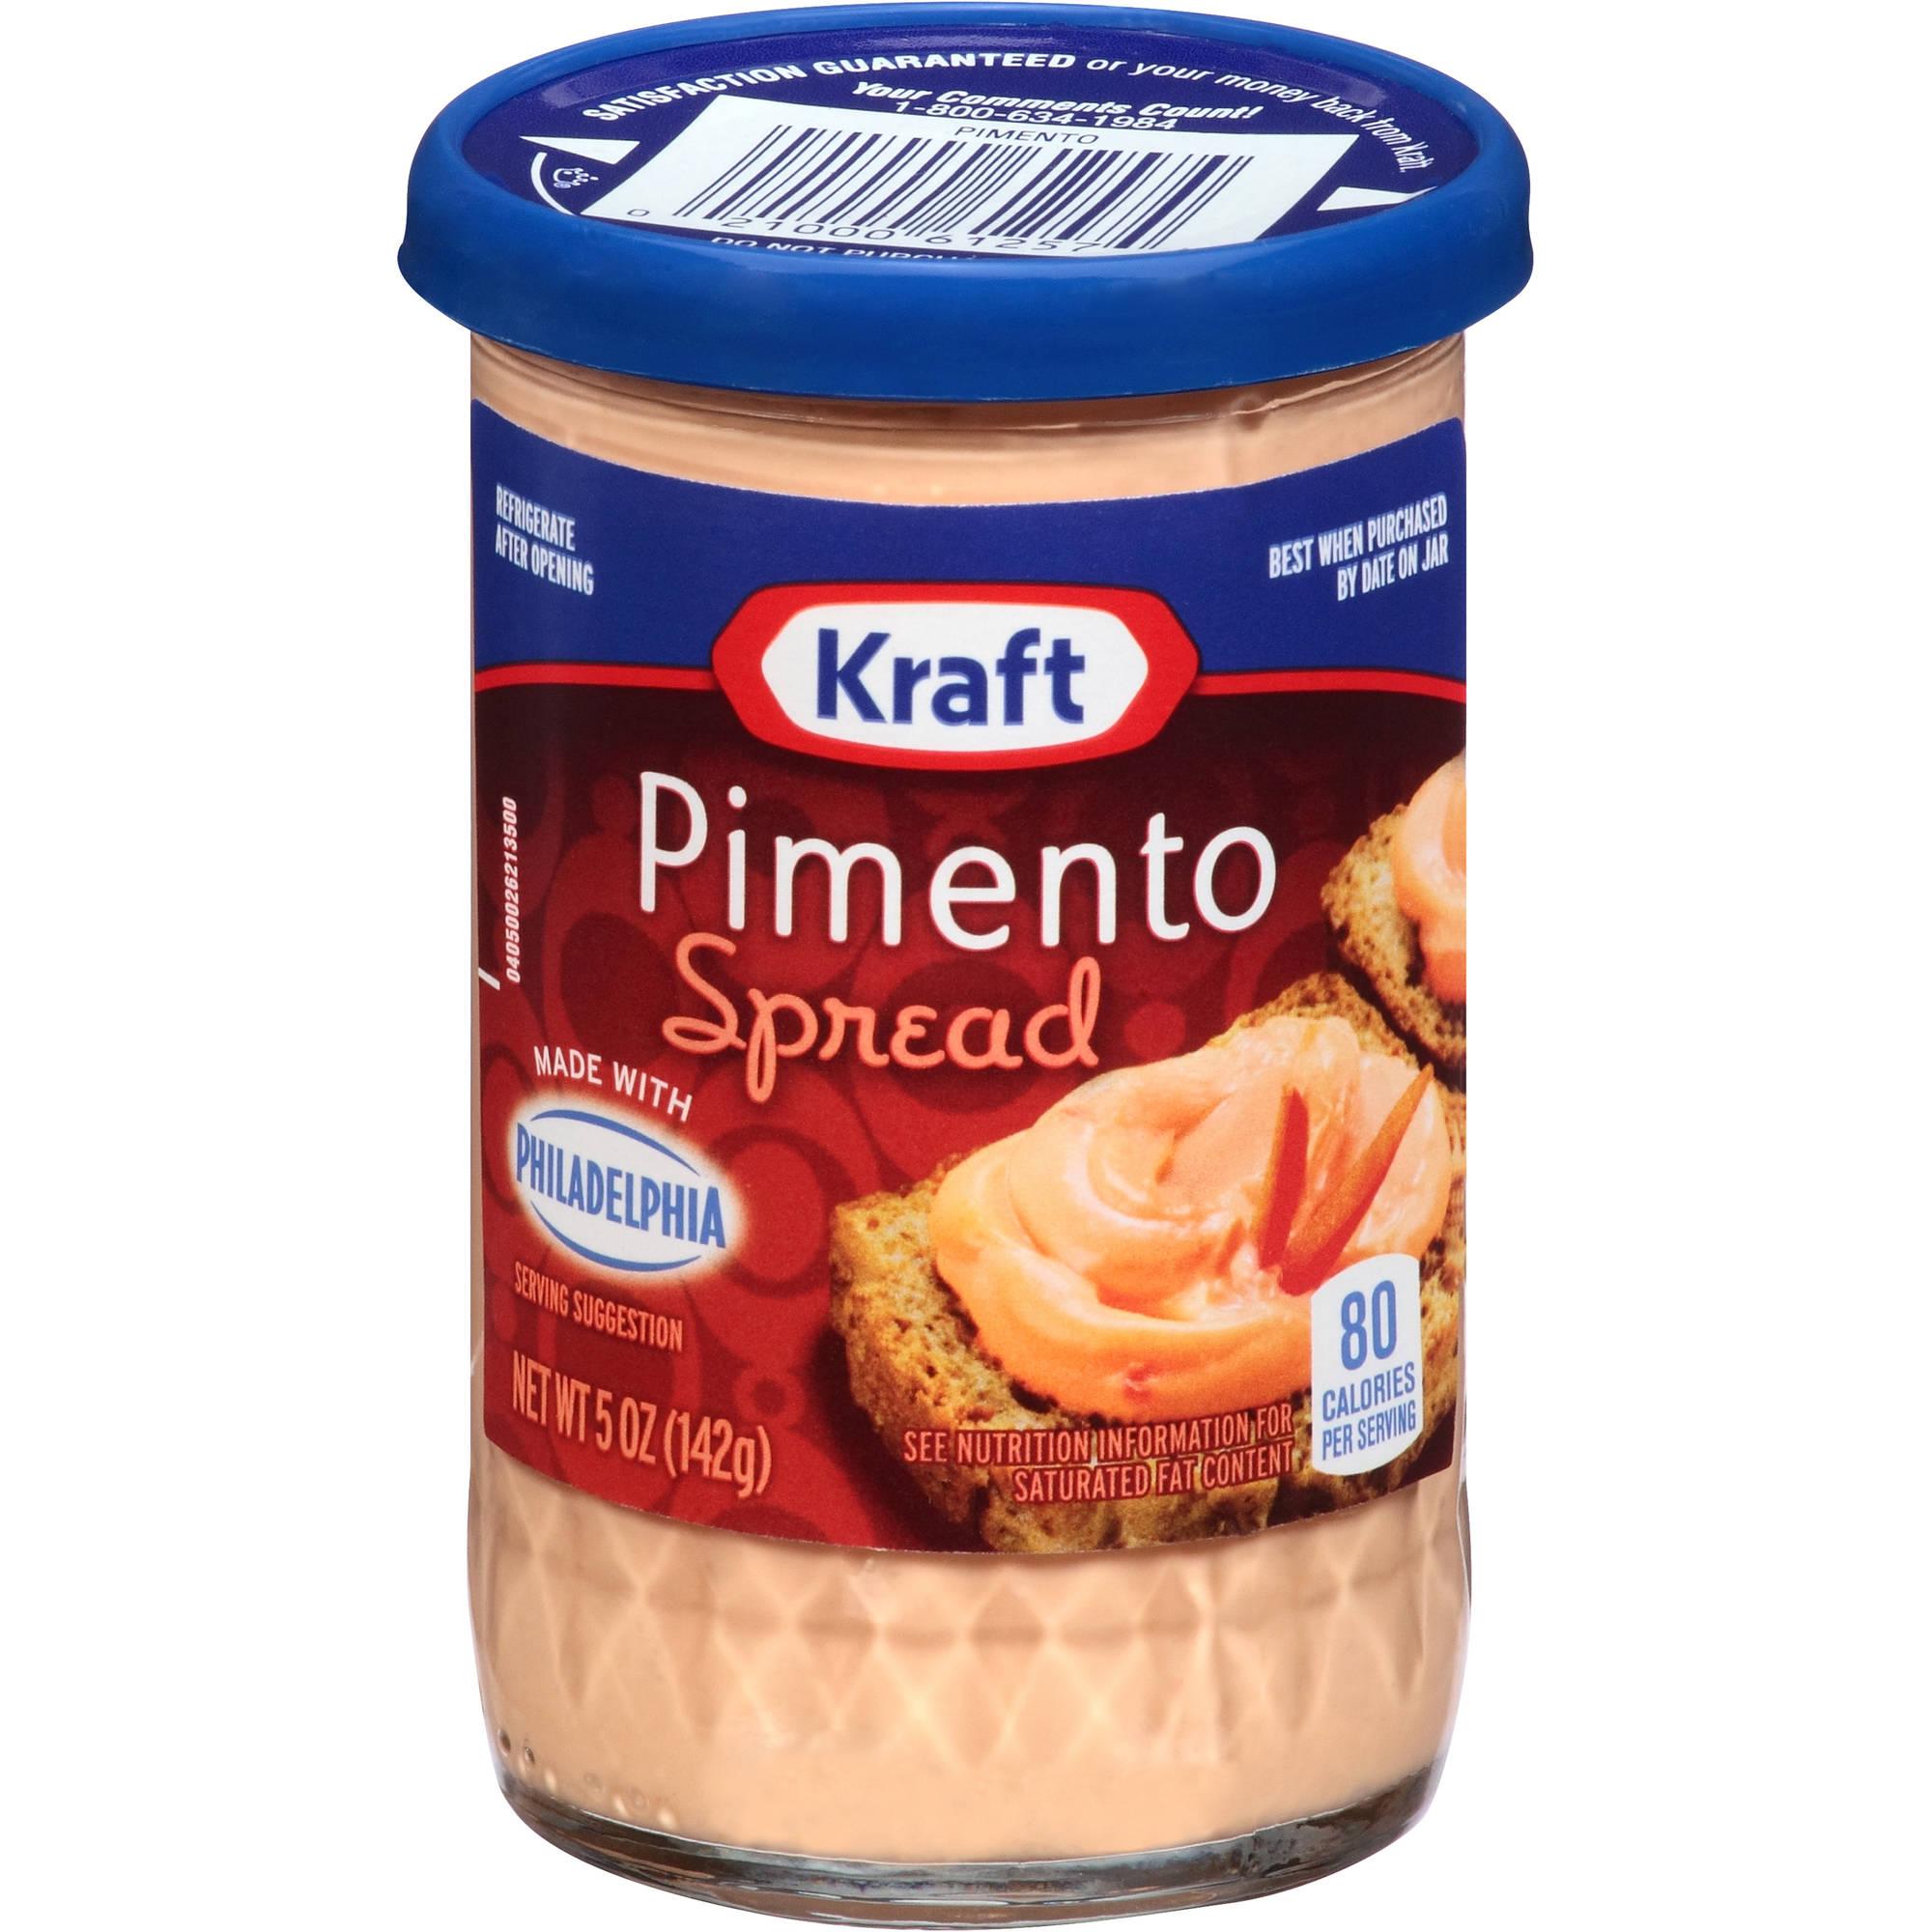 Kraft Cheese Spreads: Pimento Cheese Spread, 5 oz